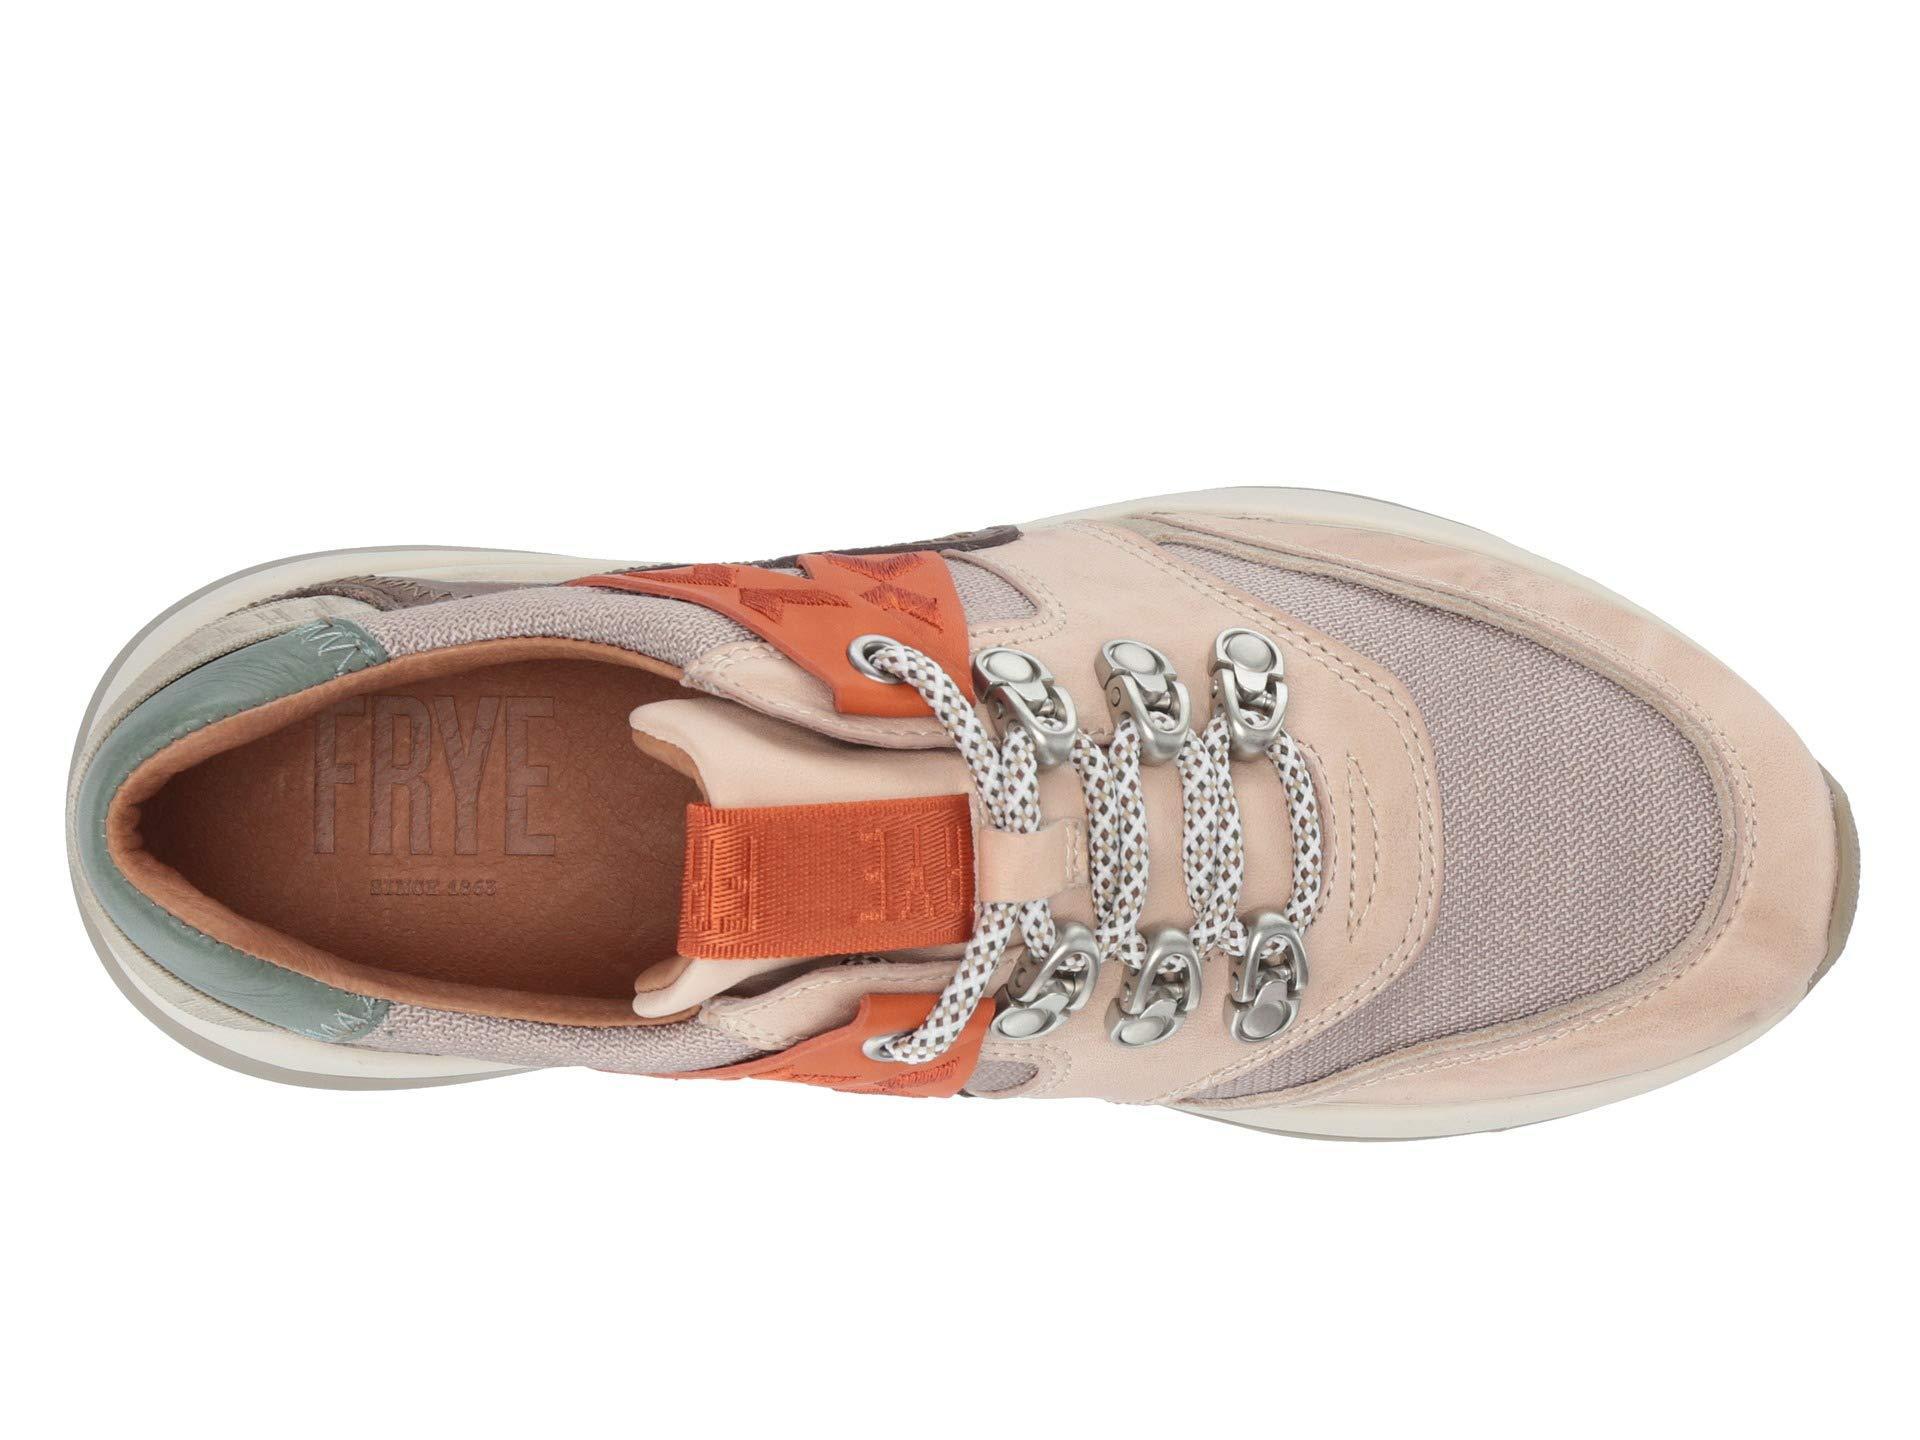 Frye Willow Trek Low Sneaker Cream